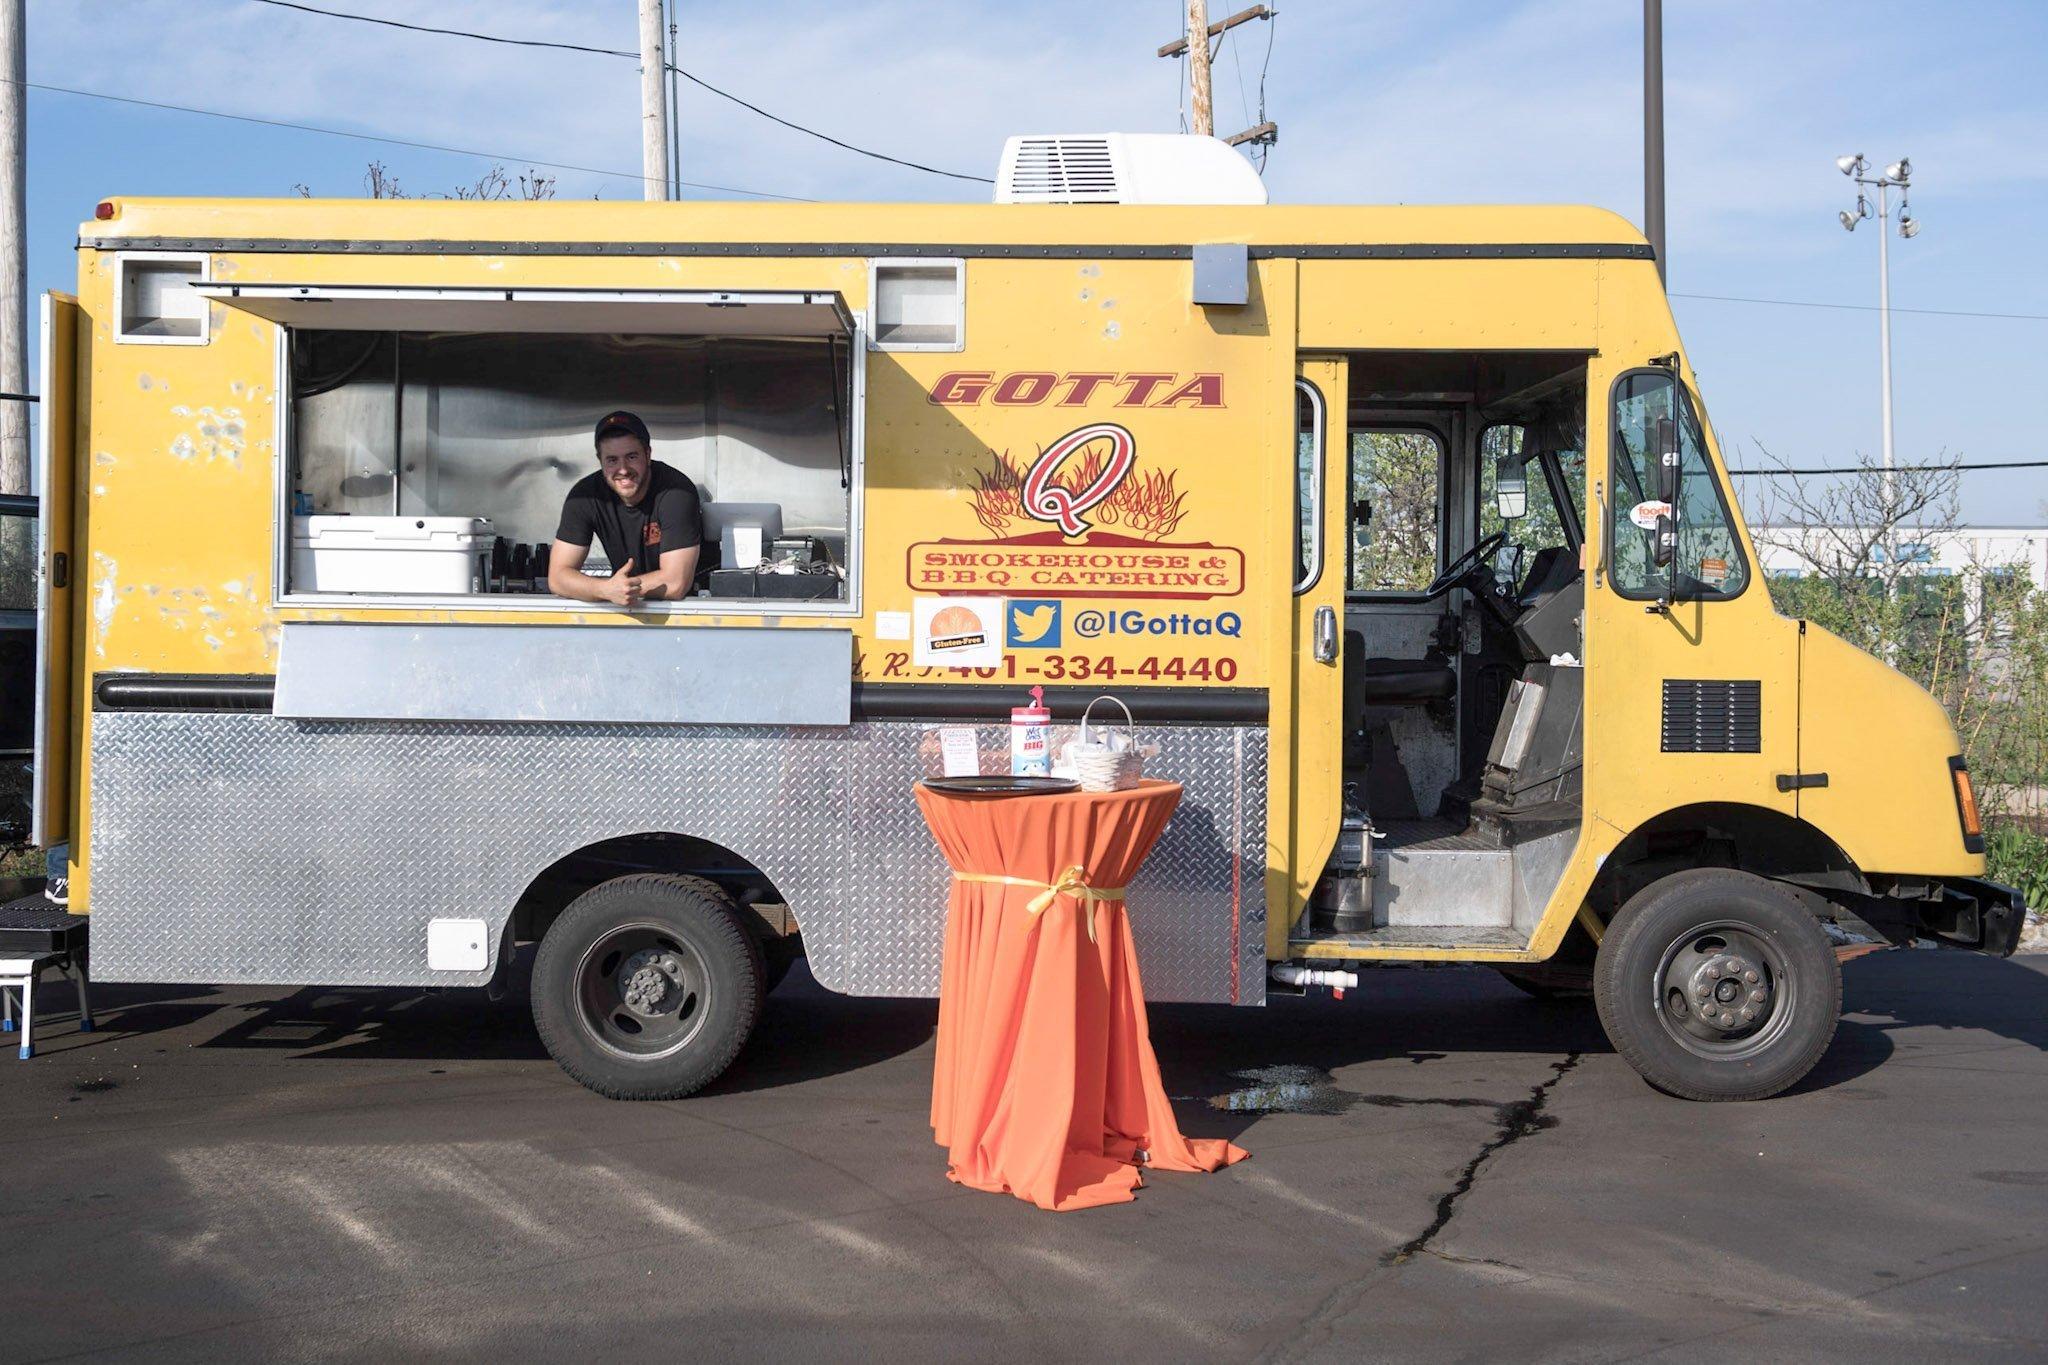 GottaQ BBQ Smokehouse at the Eat Drink RI Festival 2017